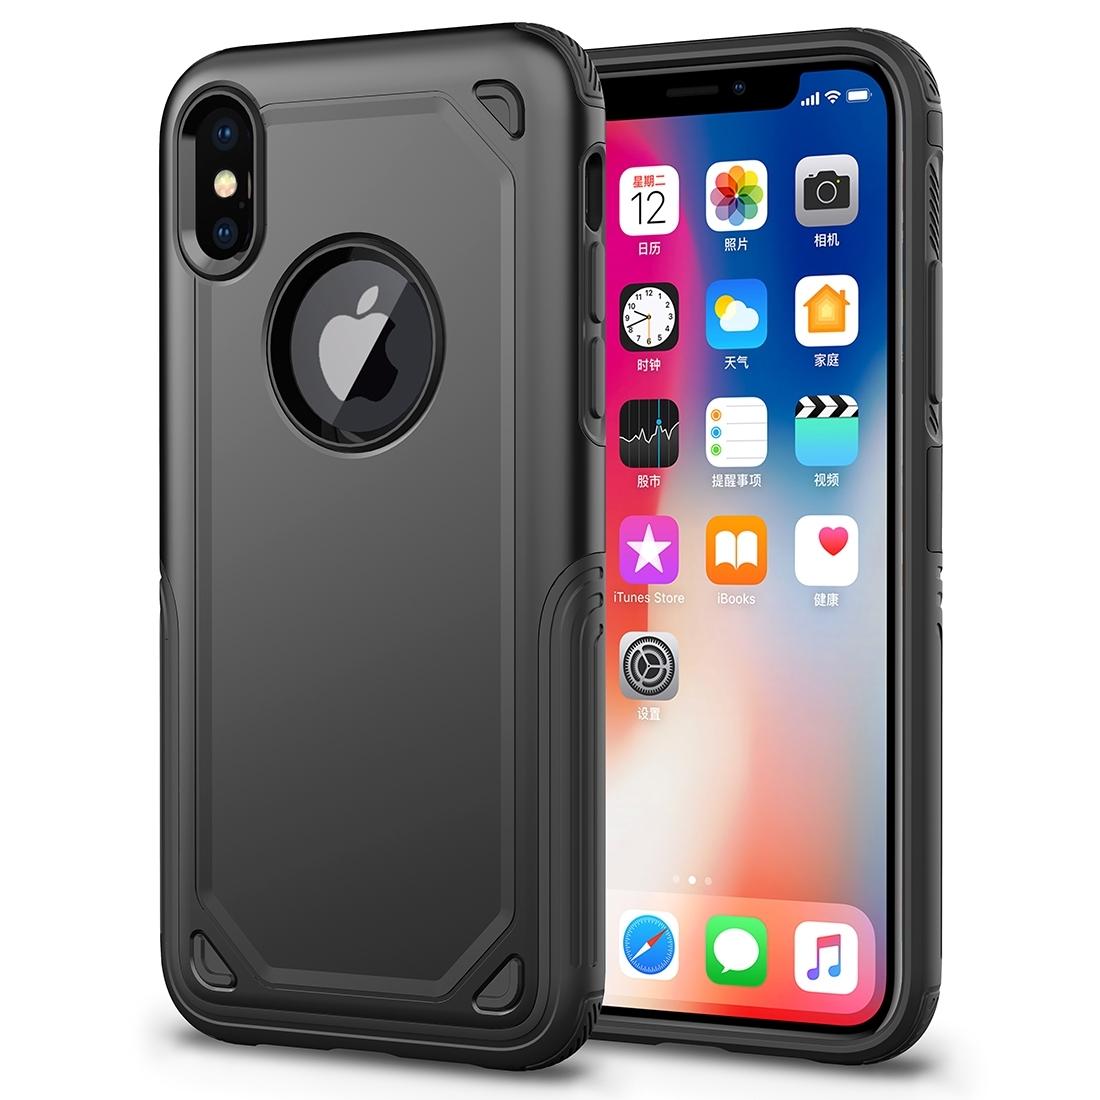 FORCELL SHOCKPROOF Ochranný kryt Apple iPhone XS Max černý a514774b2f1